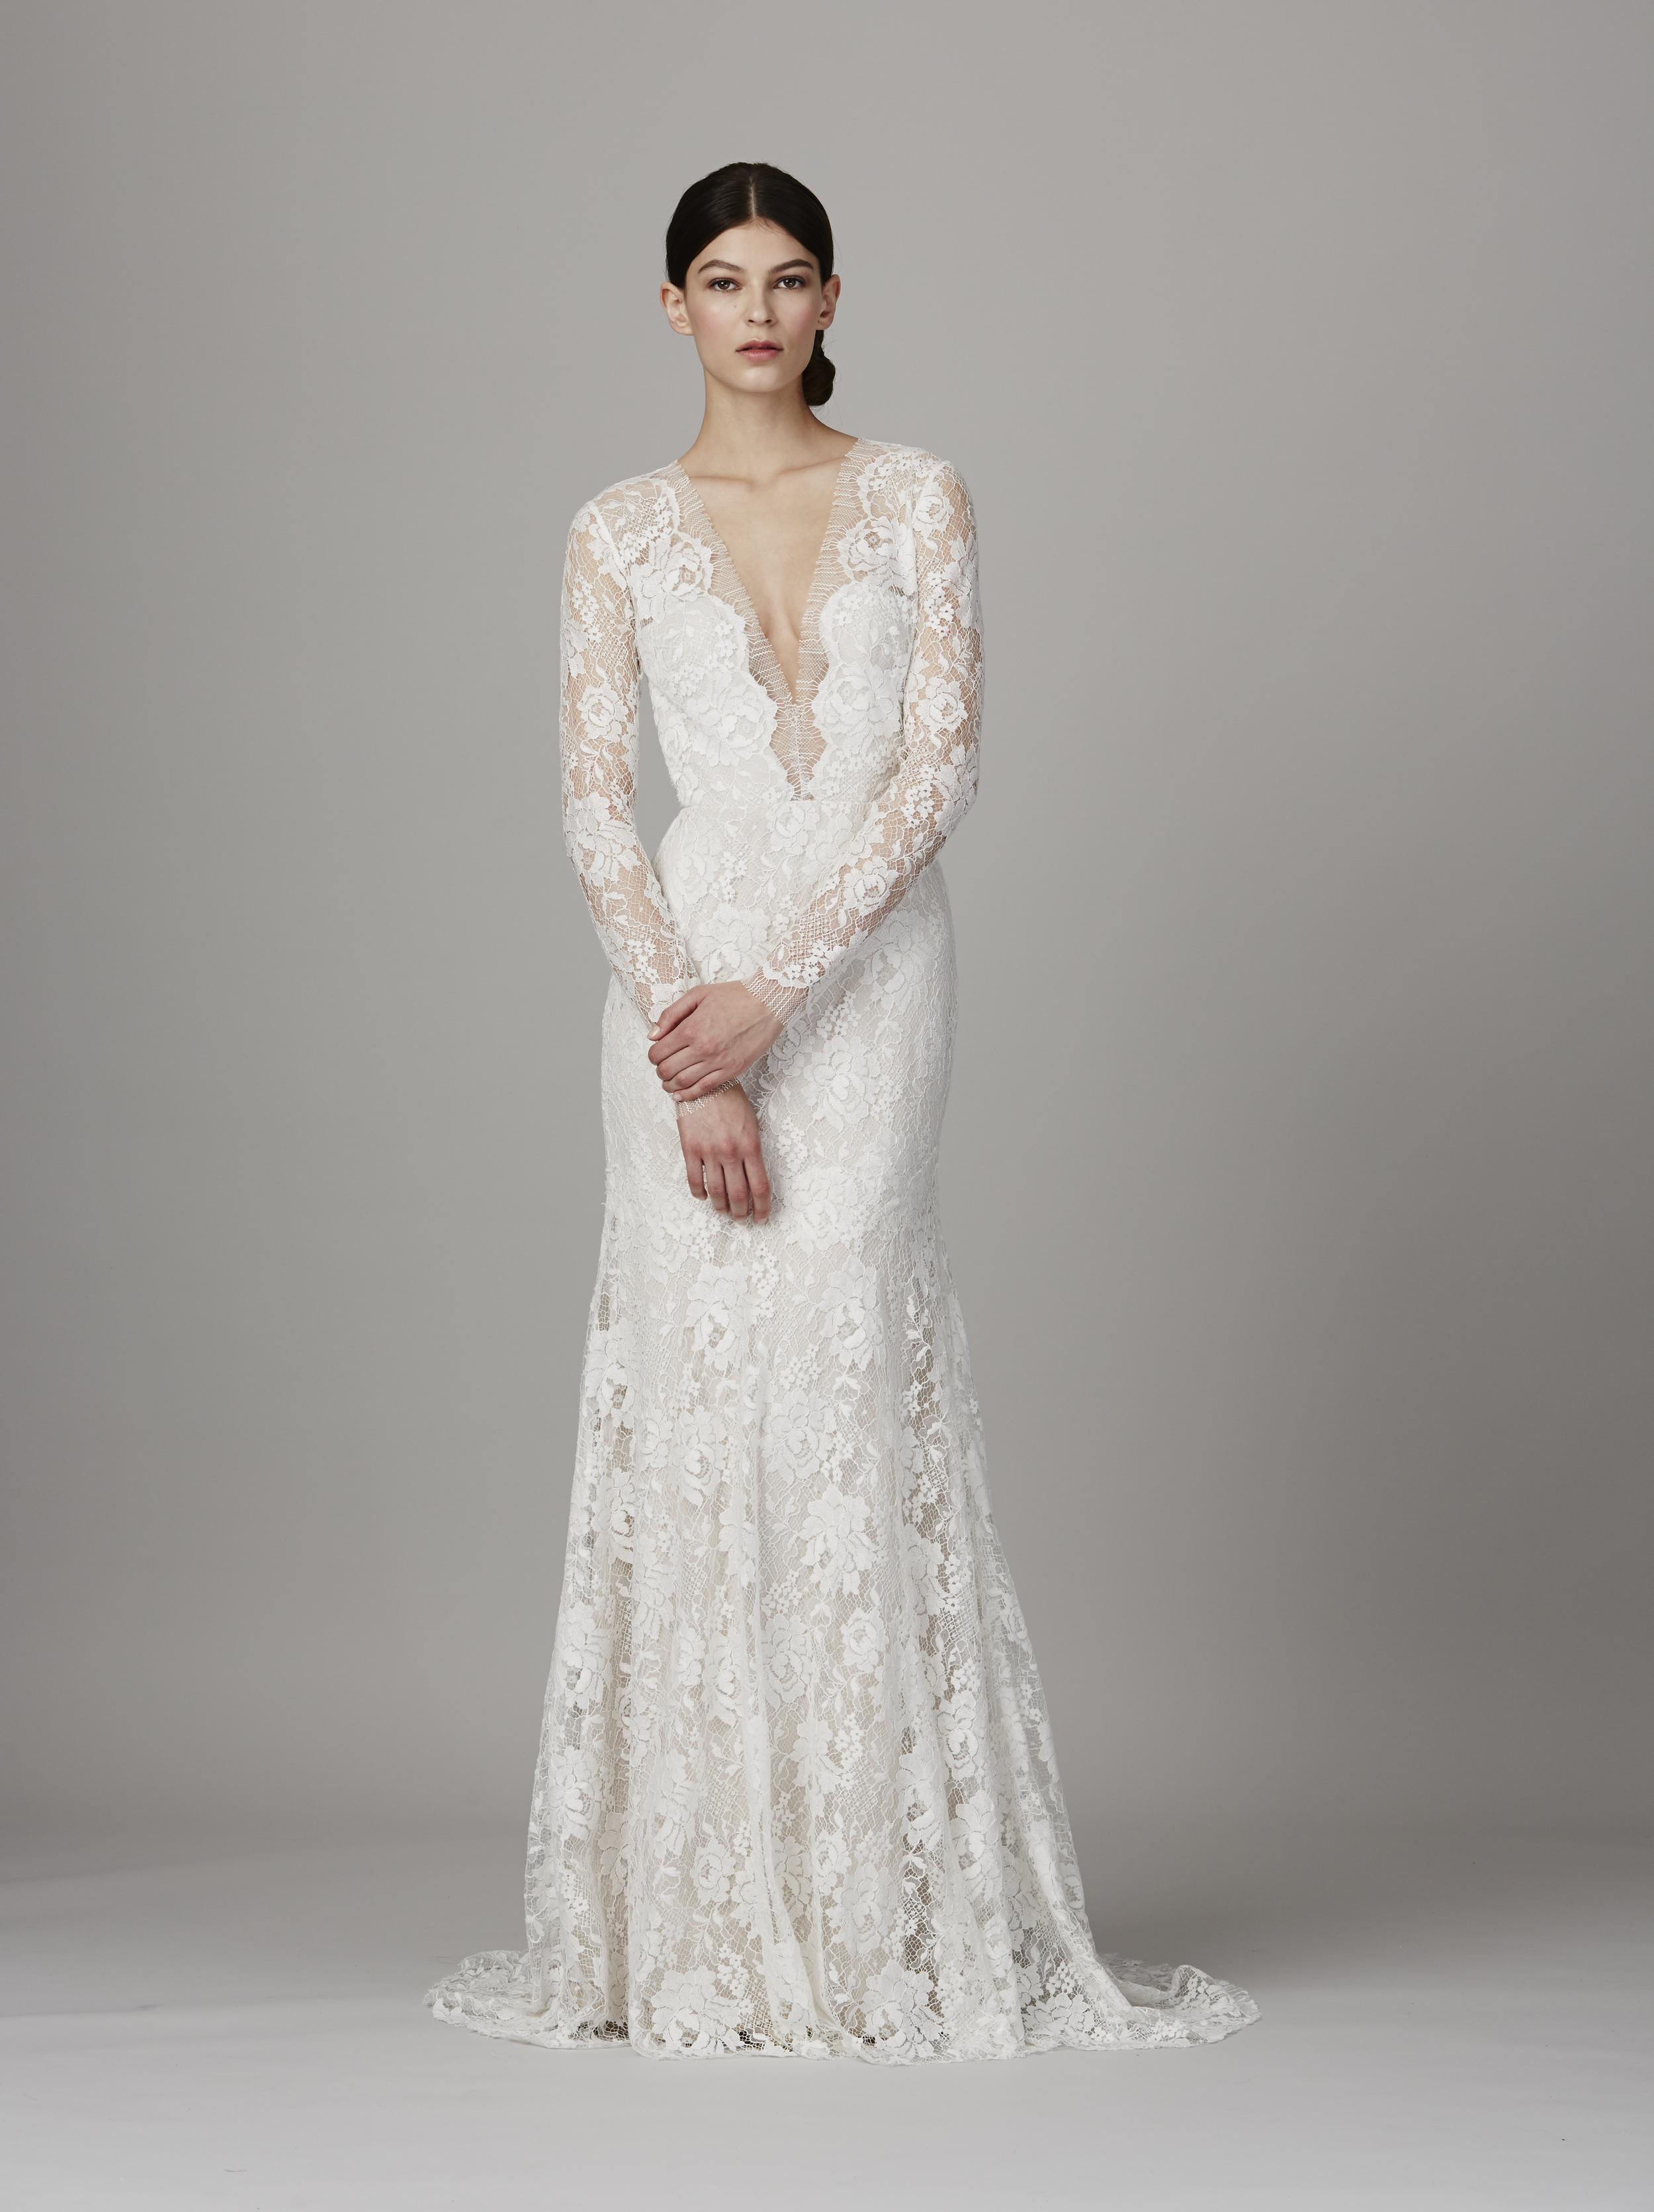 Lela Rose Bridal Collection | Available at Little White Dress Bridal Shop in Denver, Colorado